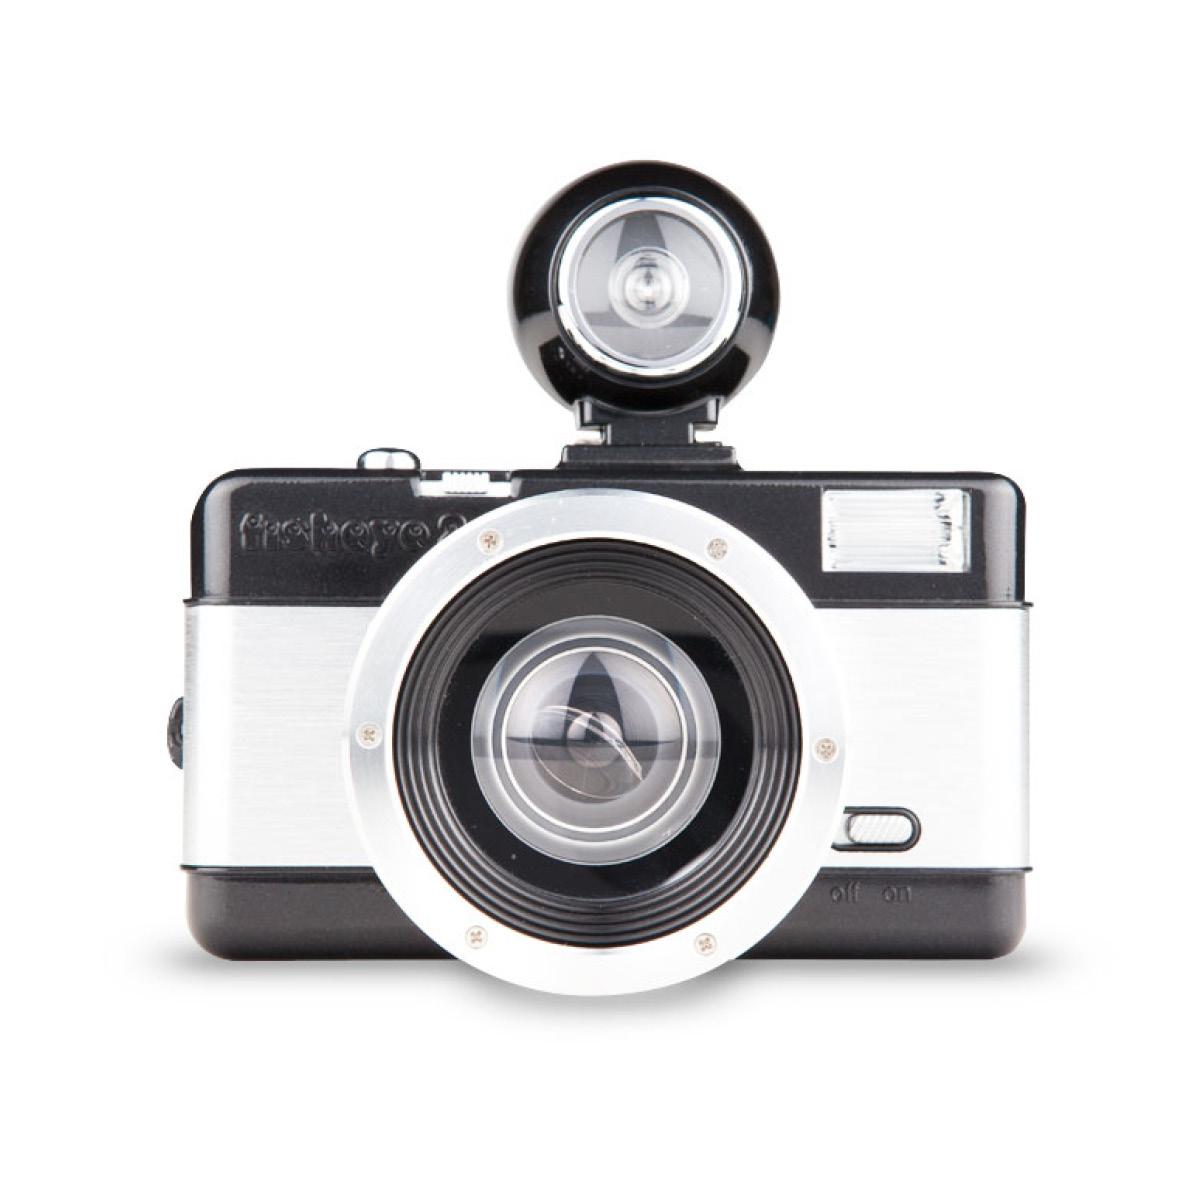 Lomo Fisheye 2 Camera